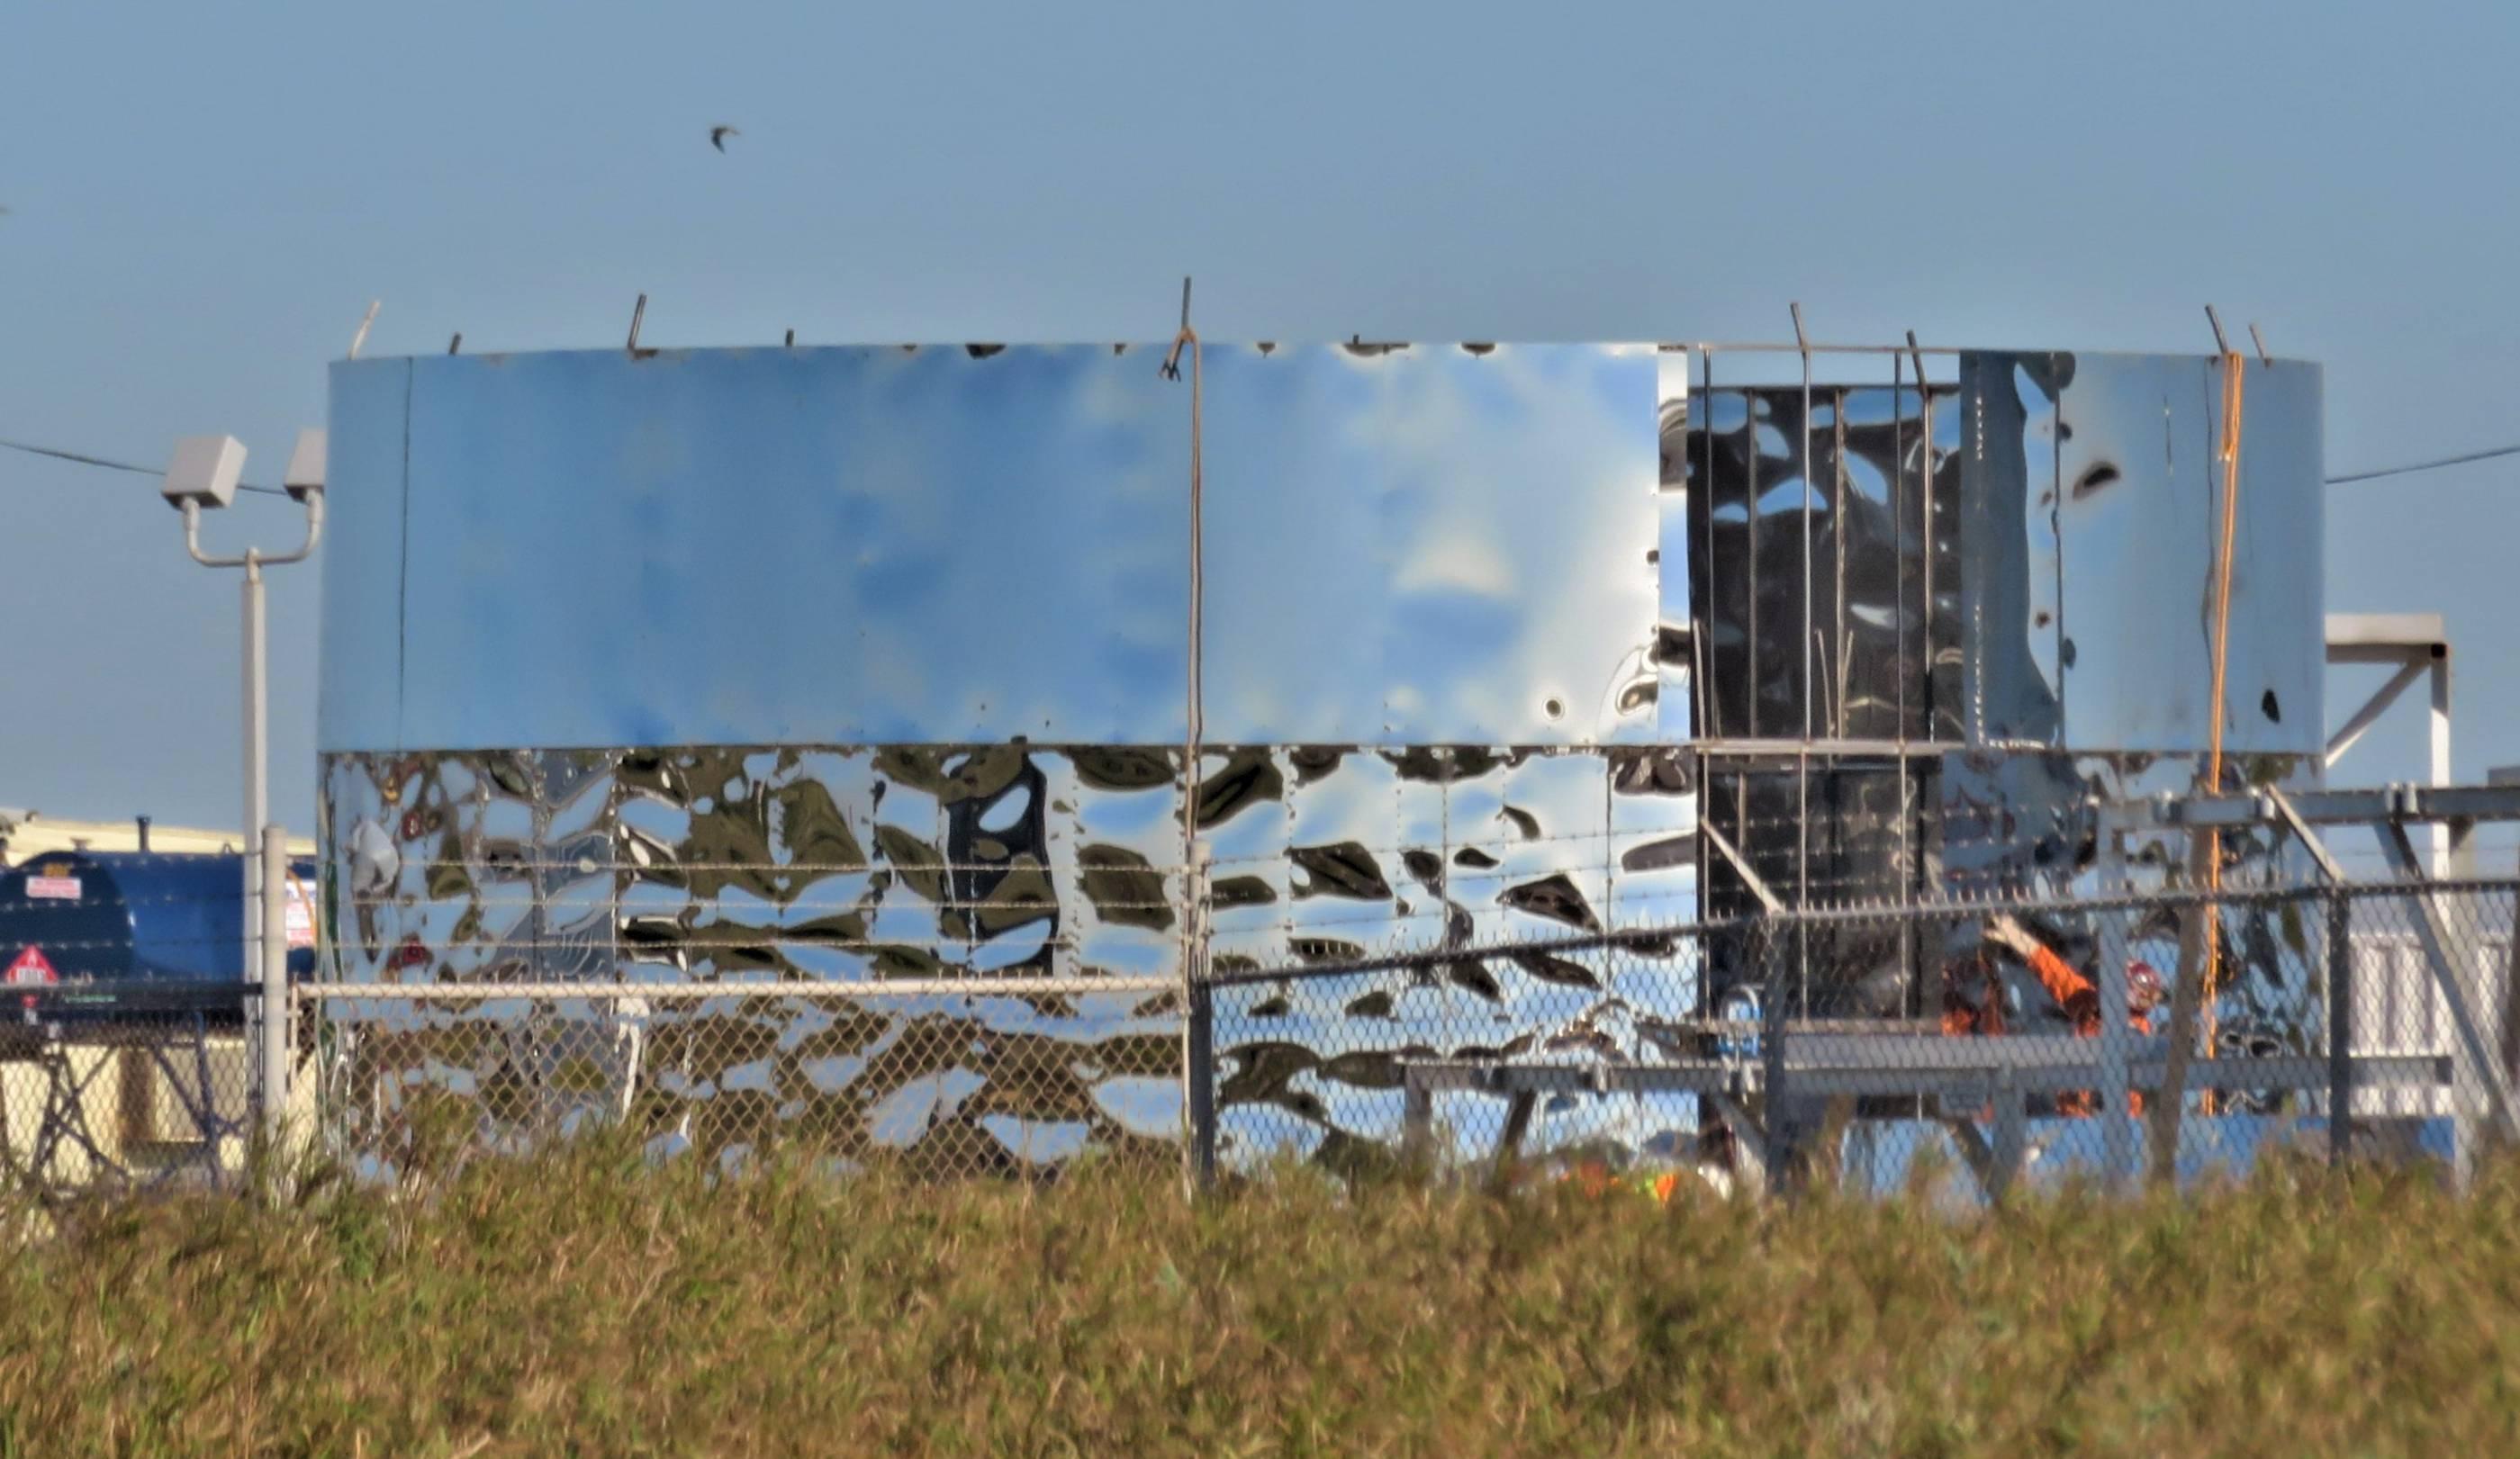 Starship hopper construction (bocachicagal – NASASpaceflight) 2(c)